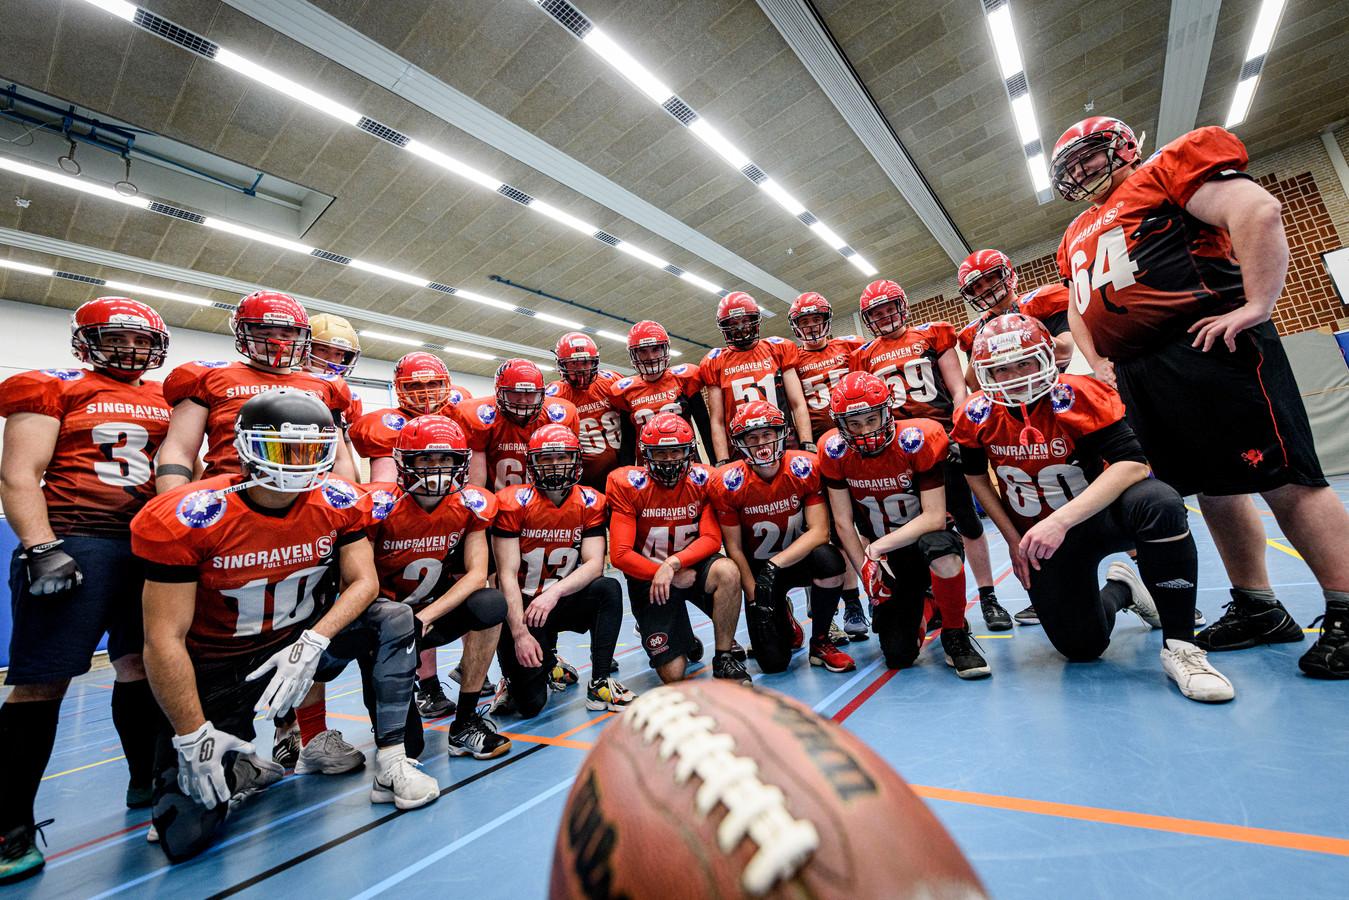 Enschede Broncos is de enige American Football club van Oost-Nederland.